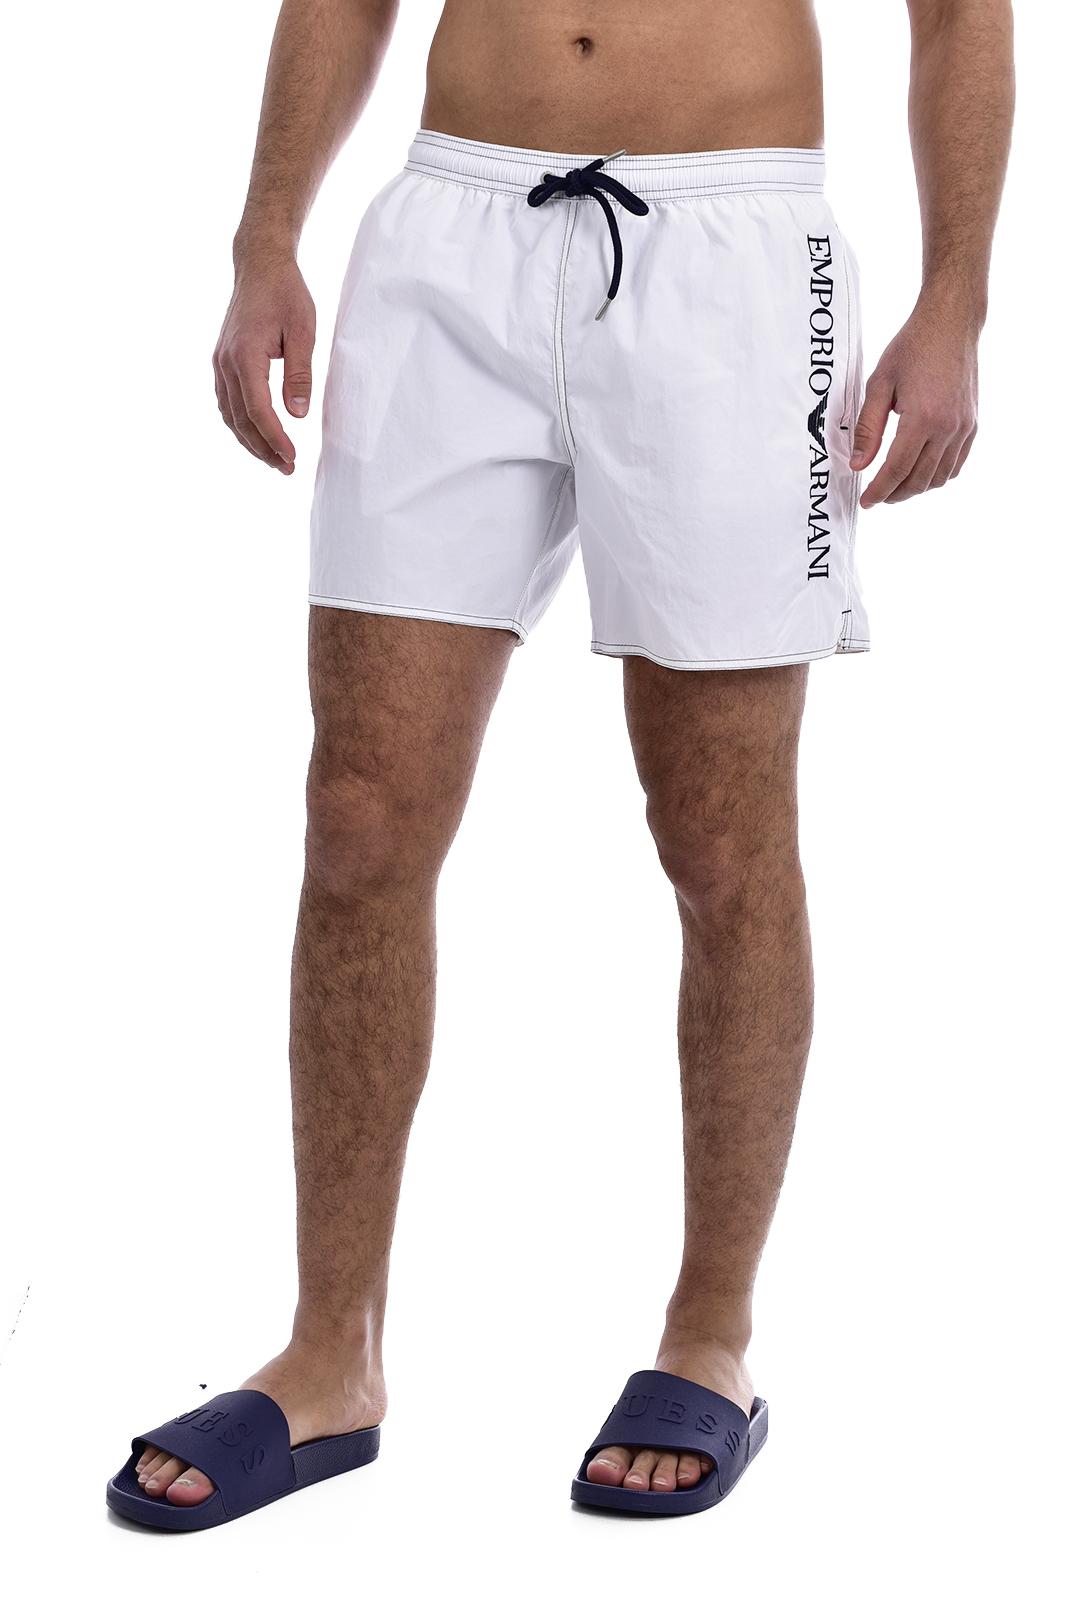 Shorts de bain  Emporio armani 211740 0P422 00010 BIANCO